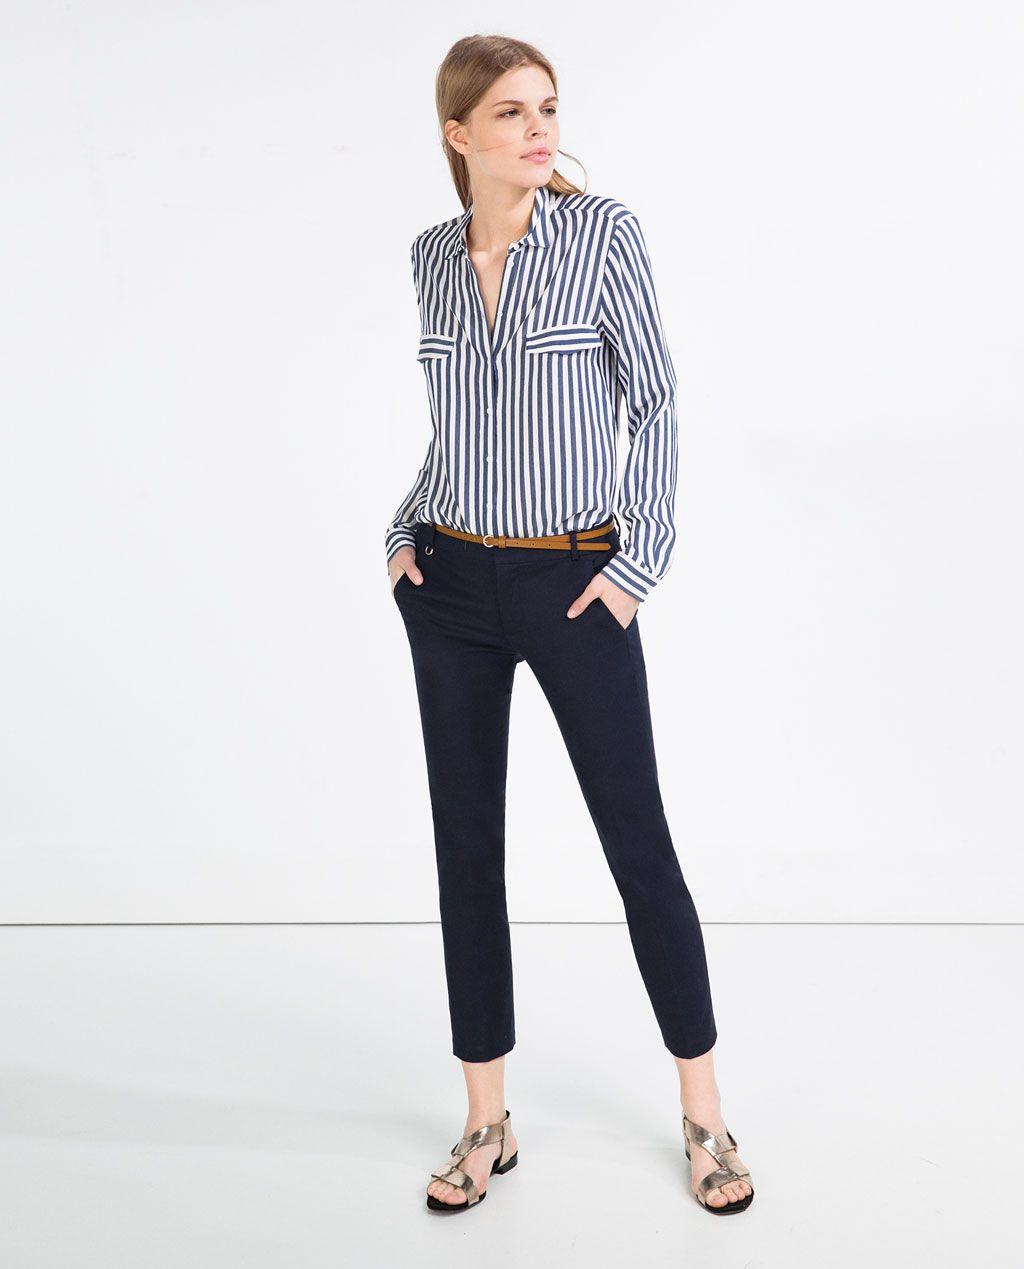 pantalones traje cinturon negros zara